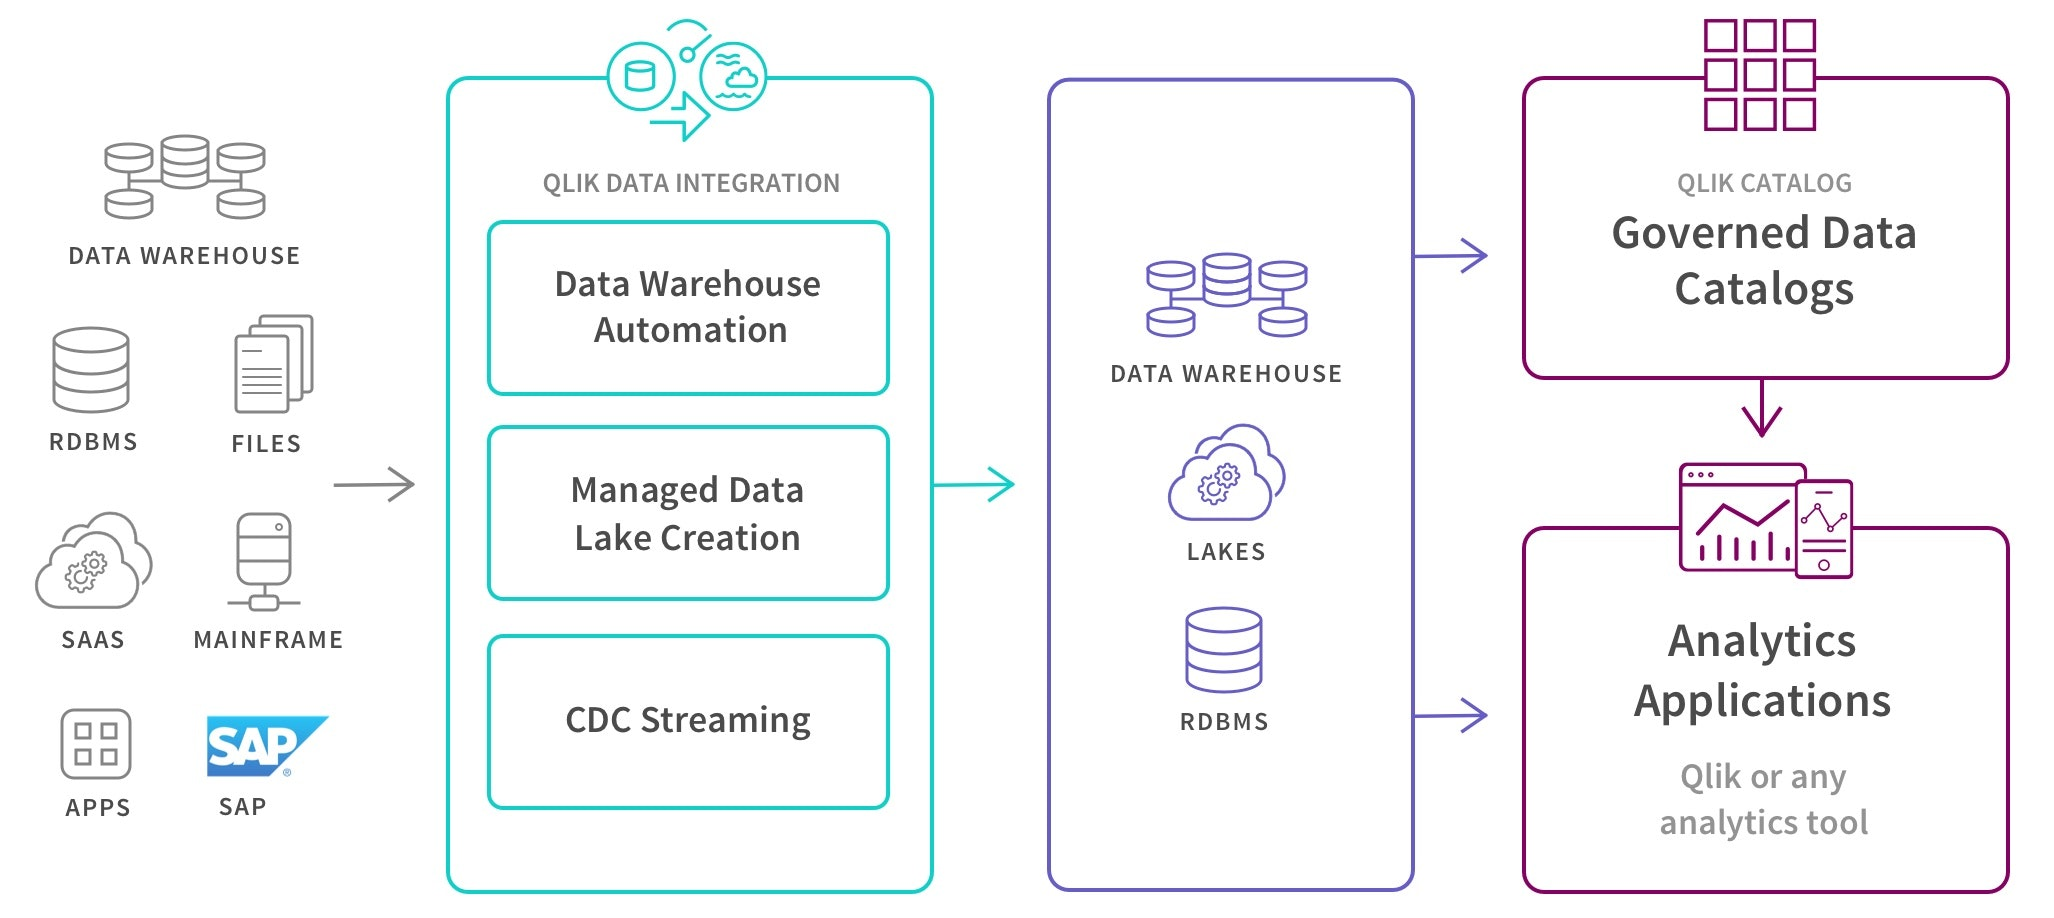 Qlik Data Integration解决方案